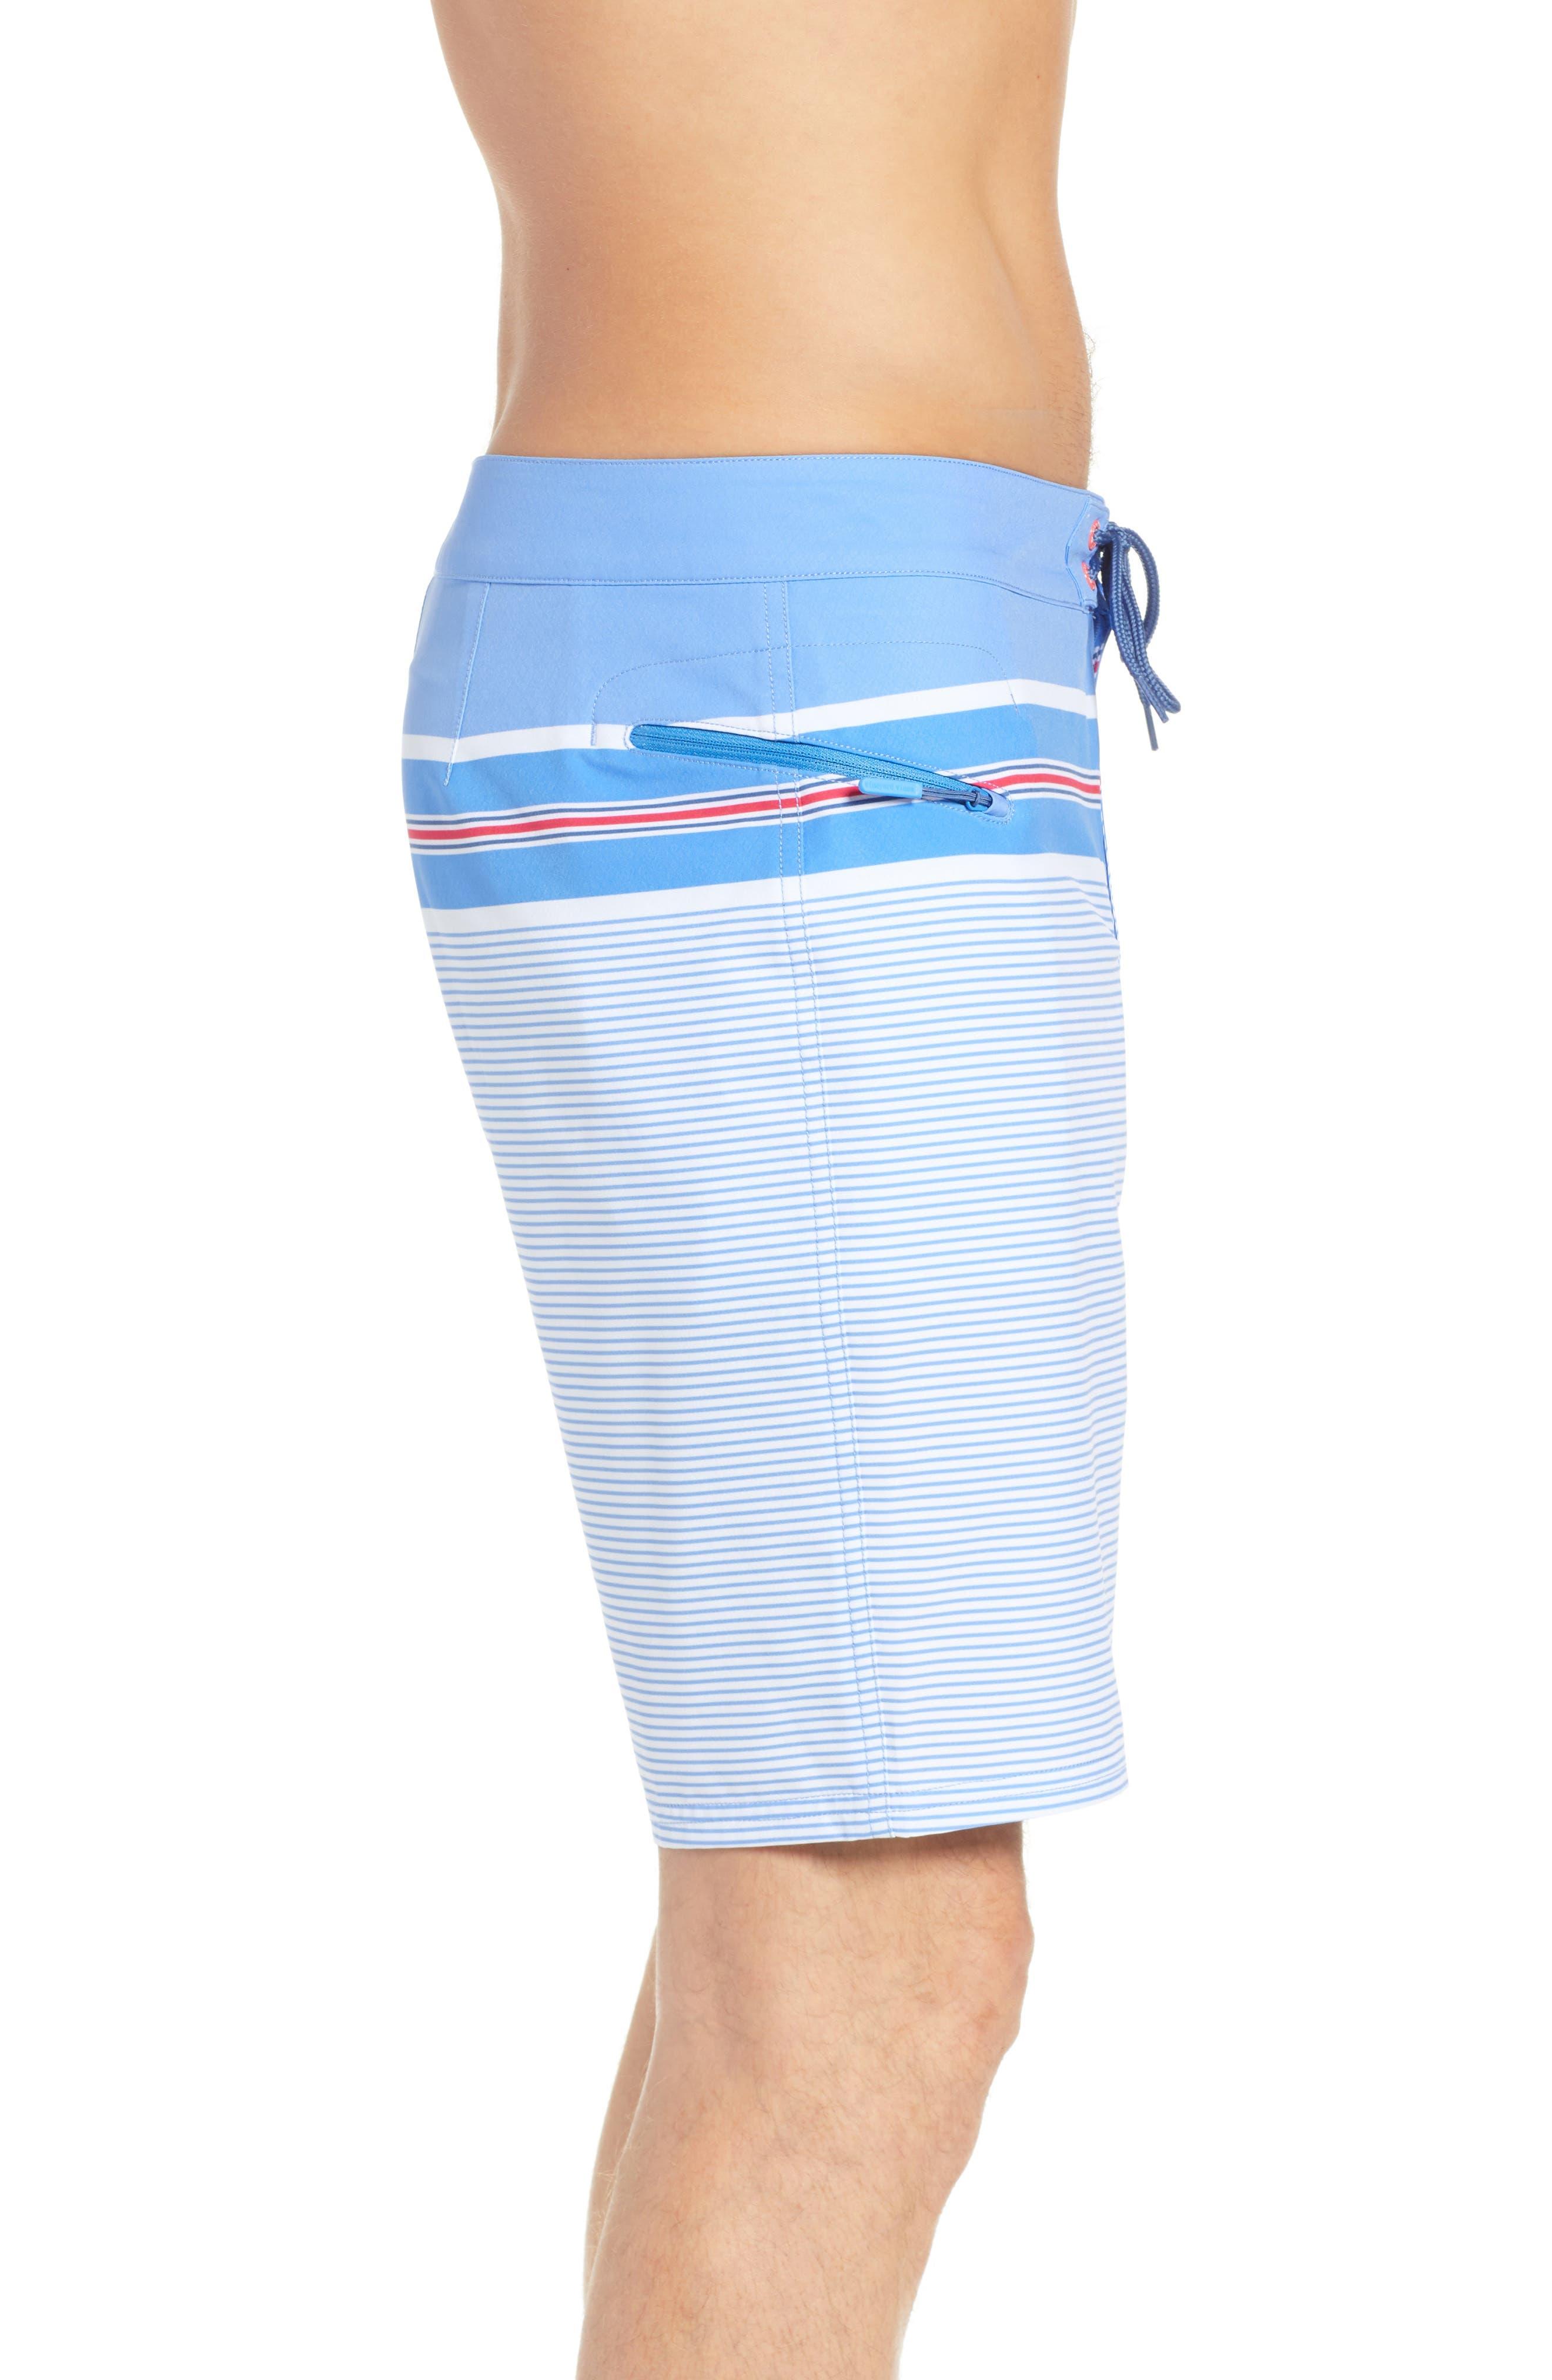 VINEYARD VINES,                             Birchcliff Stripe Board Shorts,                             Alternate thumbnail 3, color,                             484